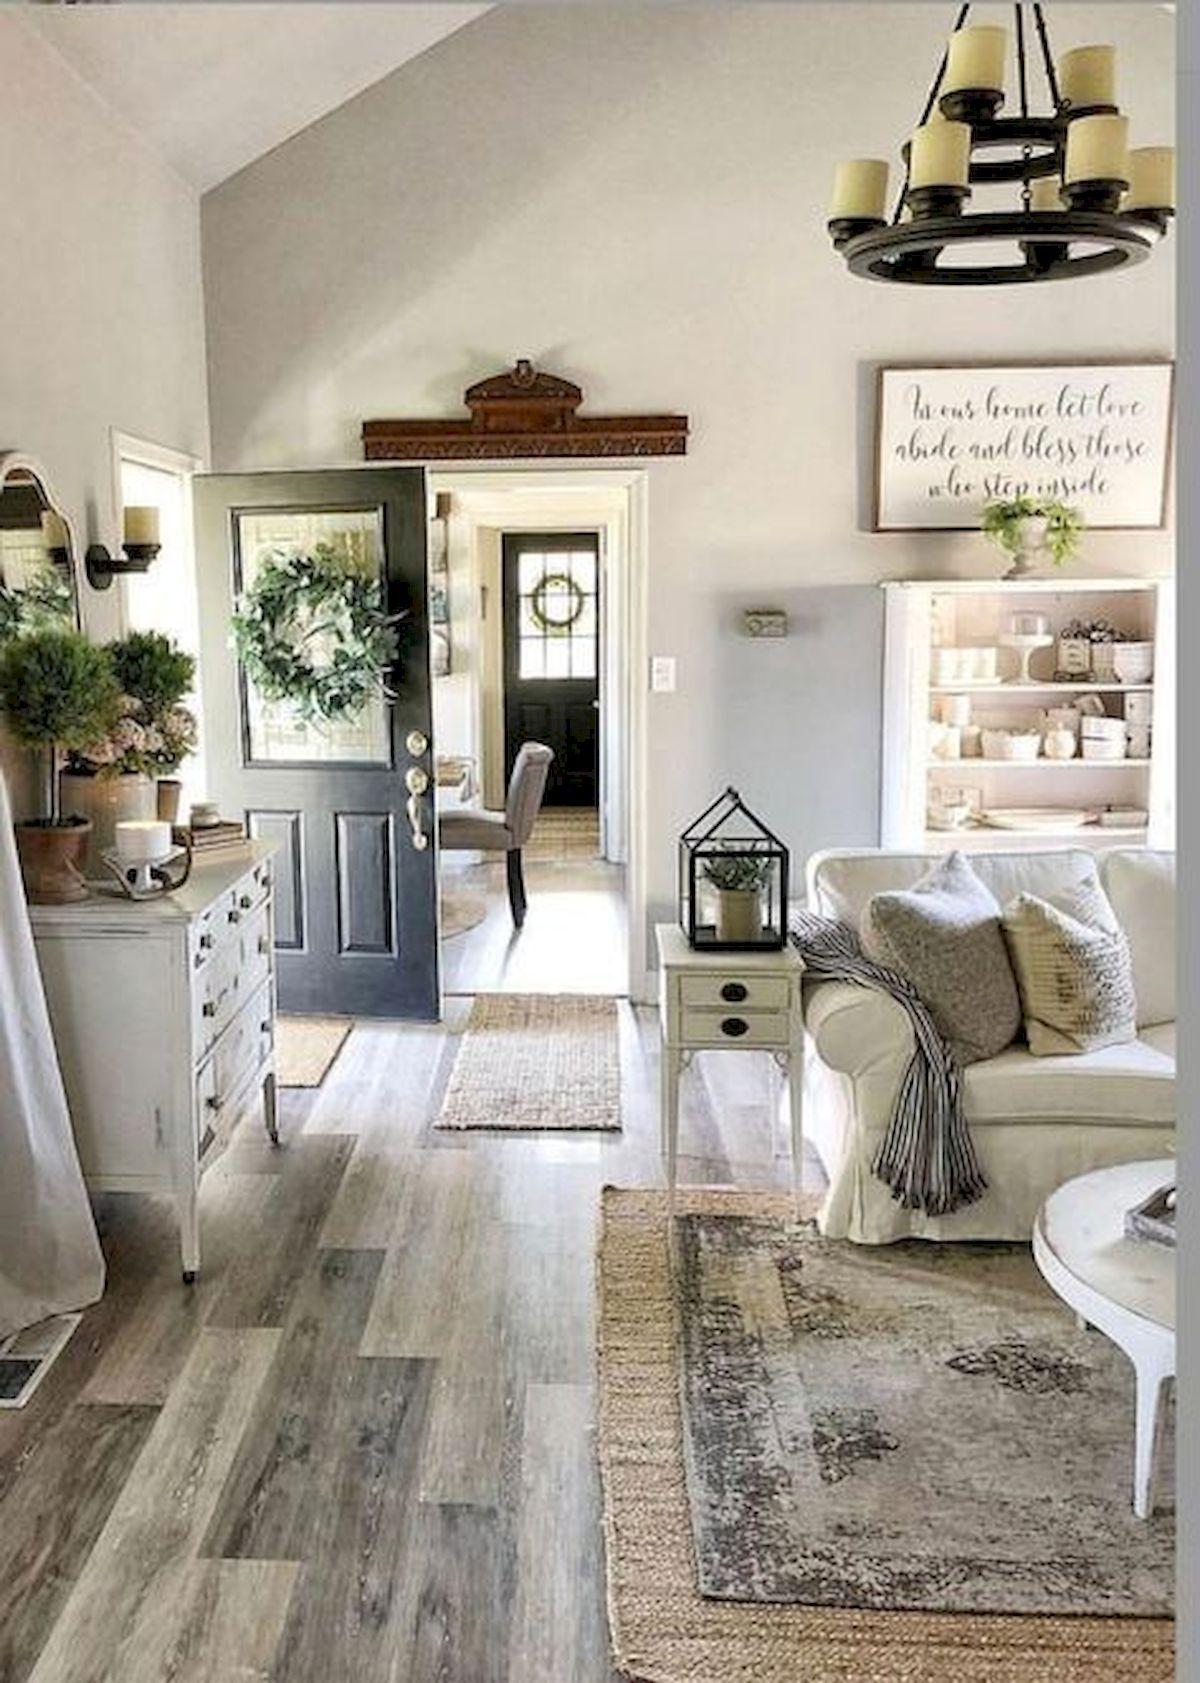 Three Living Room Ideas #homeinspo #HomeFurnitureWooden #remodelingorroomdesign